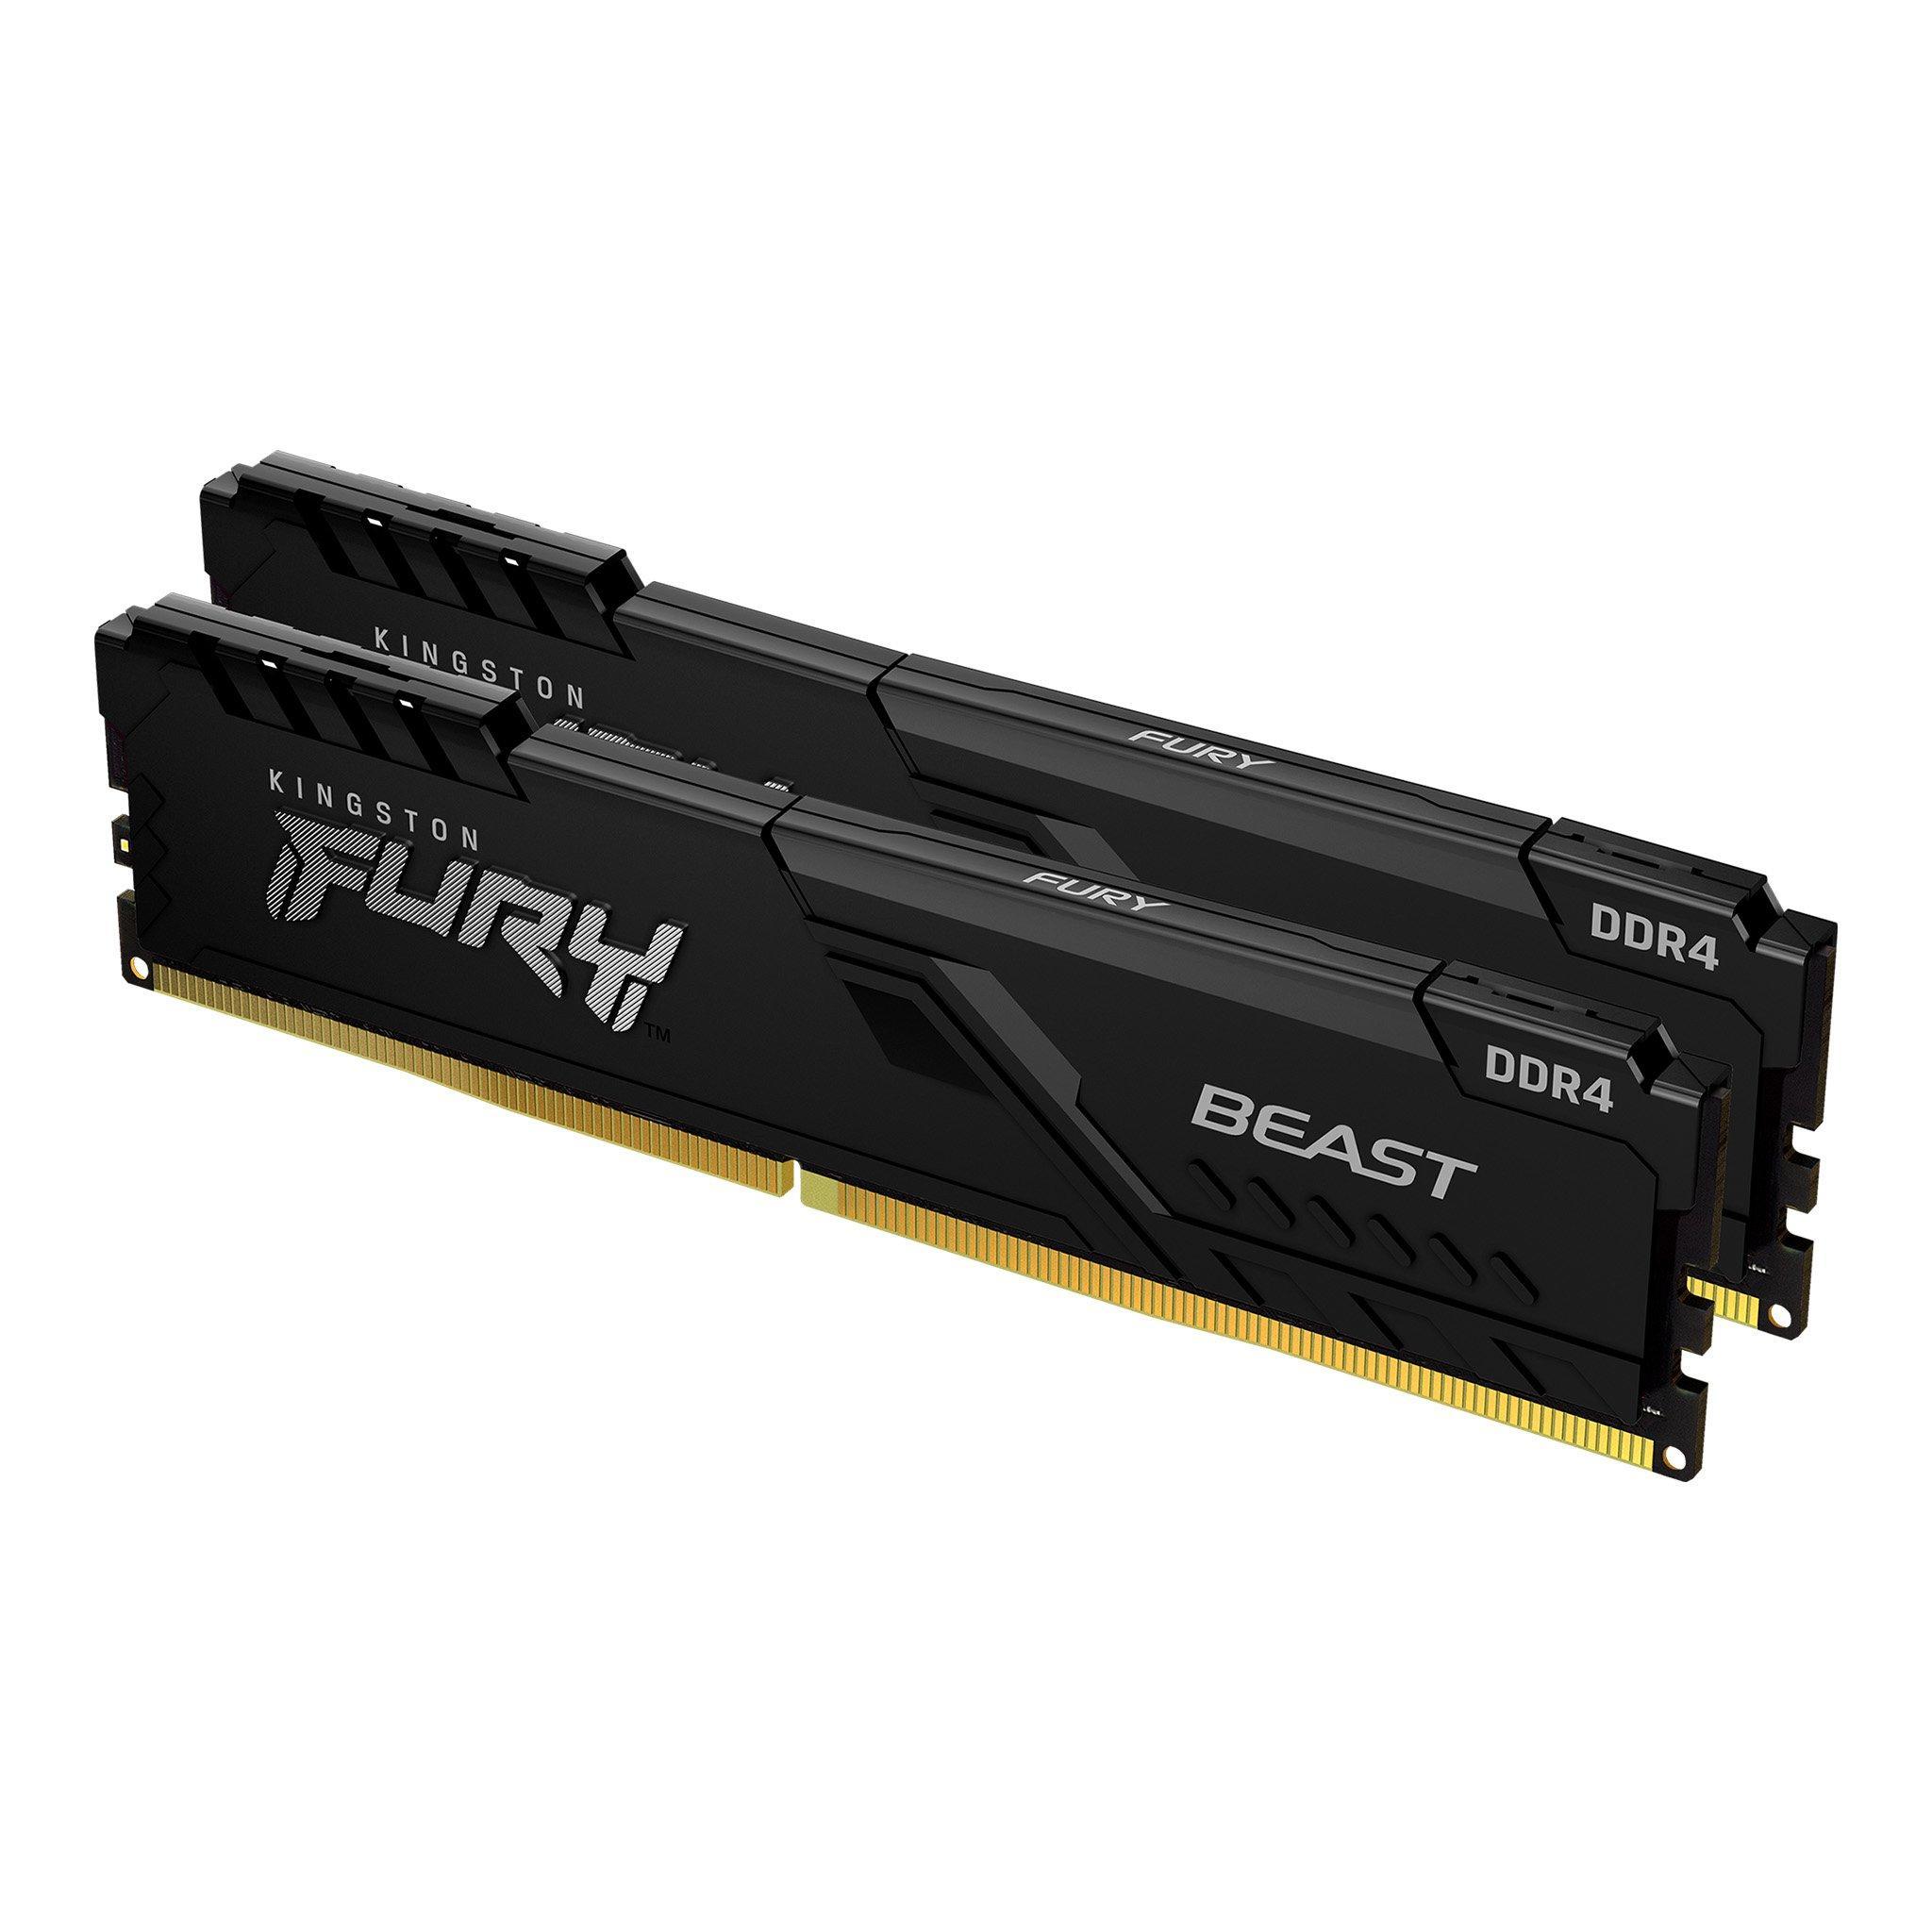 Памет Kingston FURY Beast Black 16GB(2x8GB) DDR4 PC4-21300 2666MHz CL16 KF426C16BBK2/16